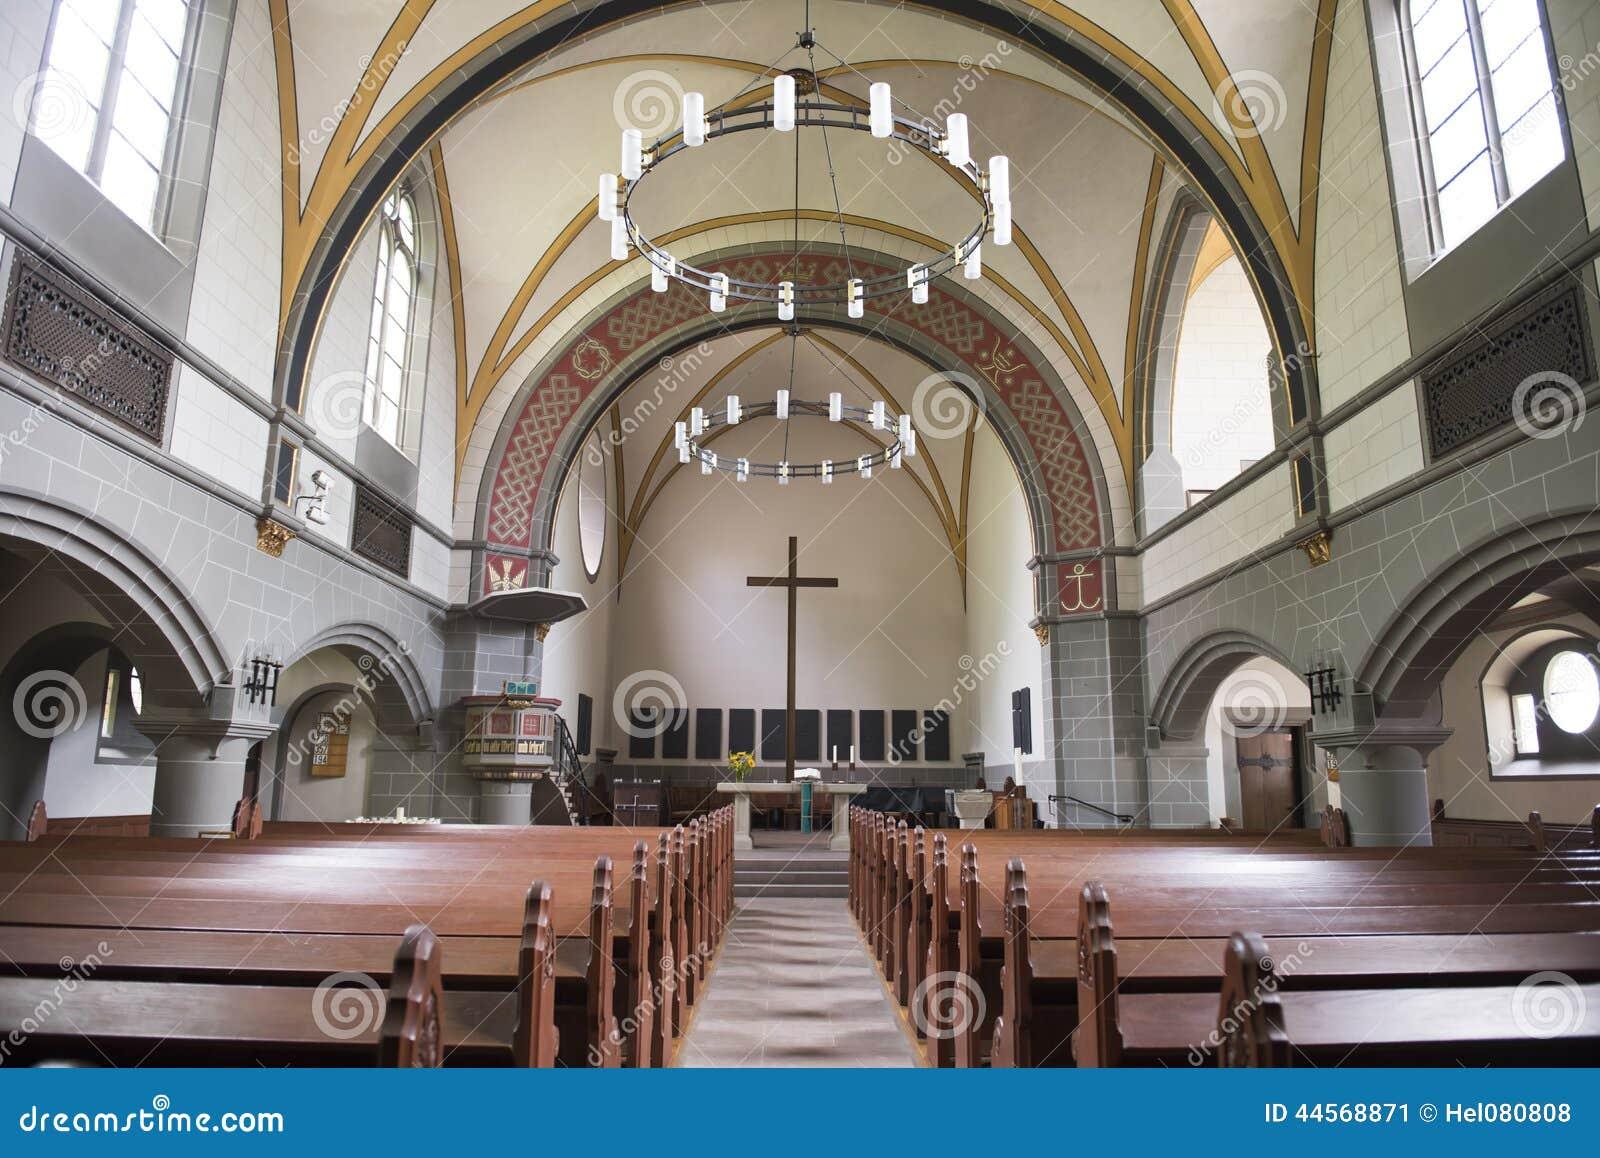 christ church kassel stock photo image 44568871. Black Bedroom Furniture Sets. Home Design Ideas